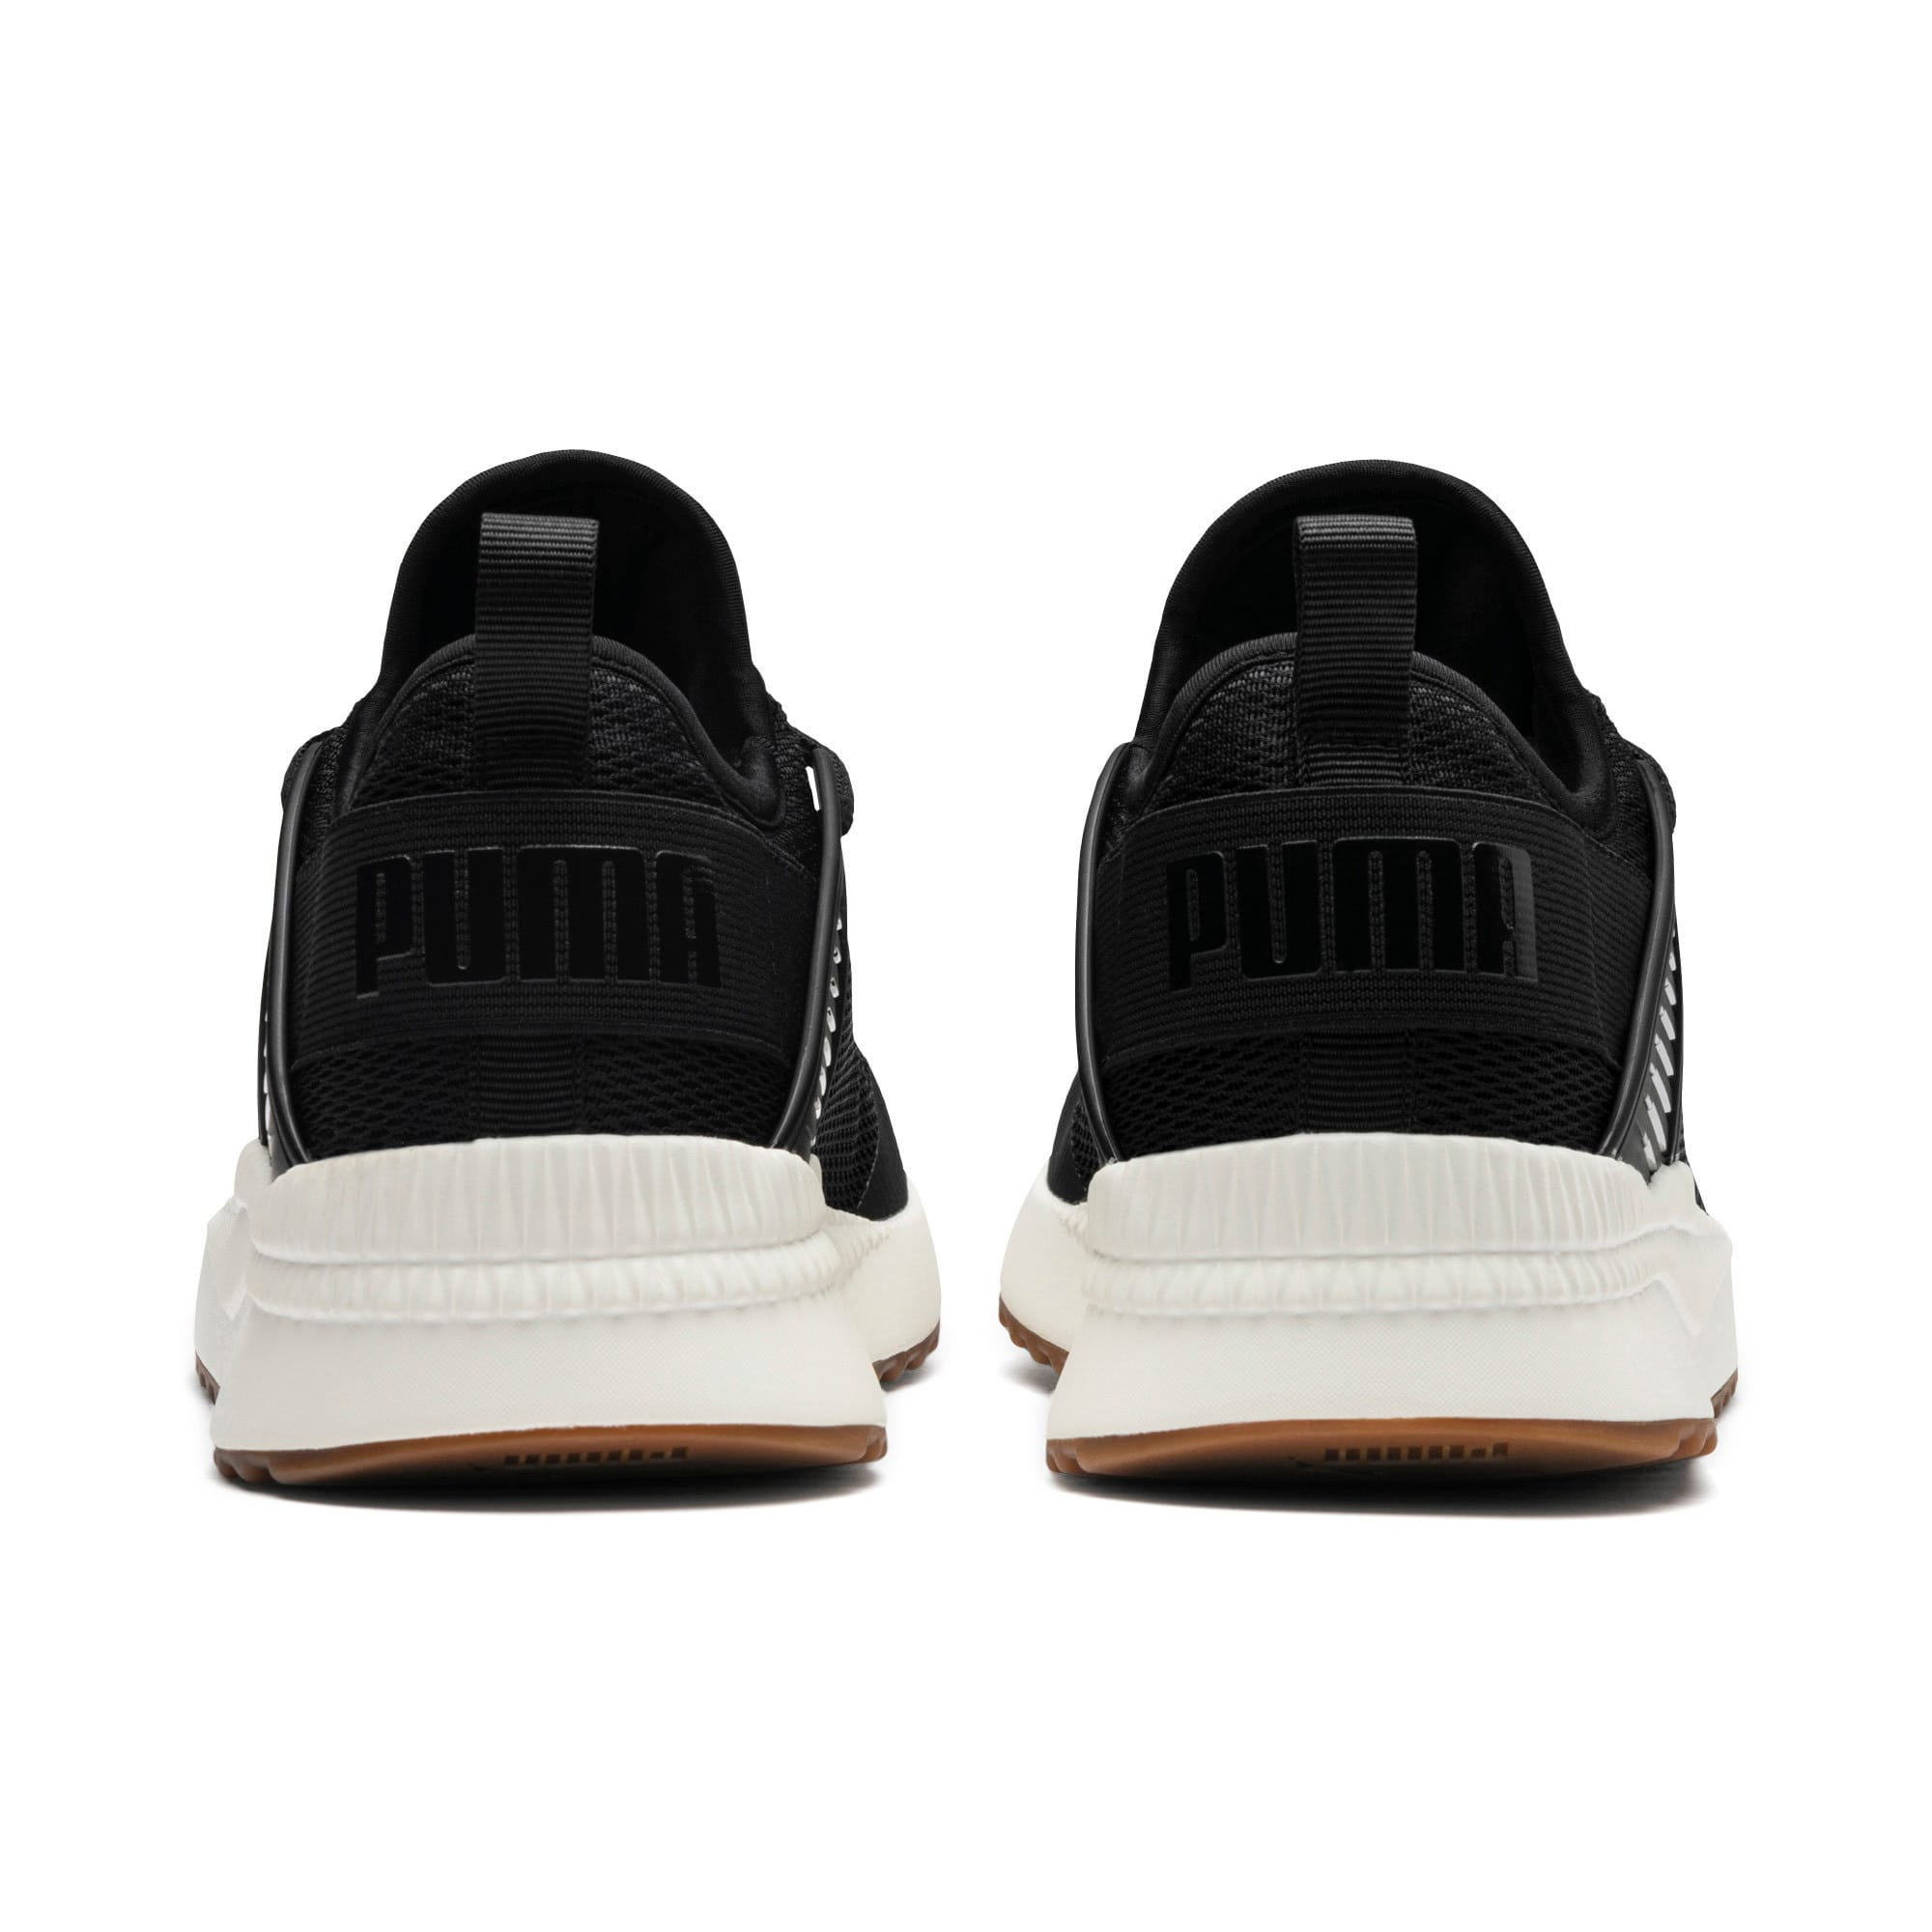 Thumbnail 4 of Pacer Next Cage Sneakers, P. Black-P. Black-Whis.White, medium